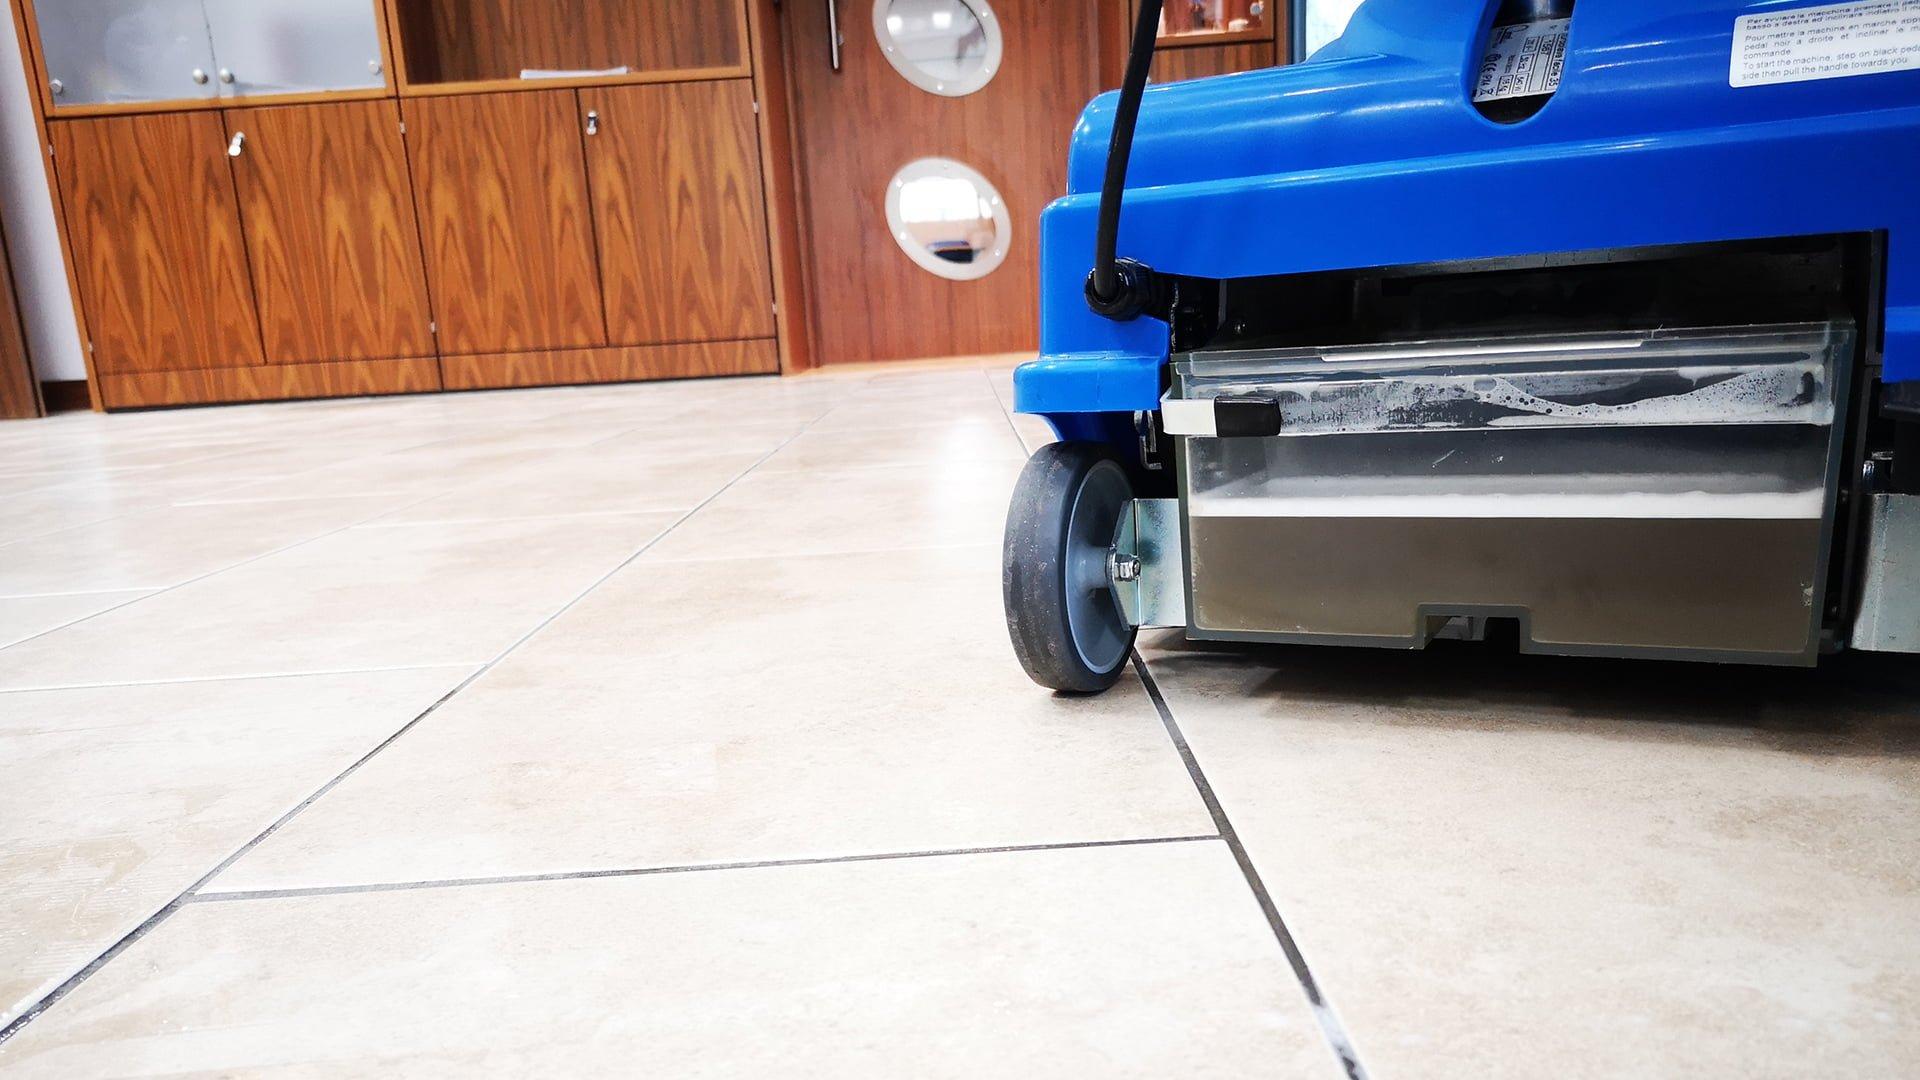 Floor Cleaning Machine - Stone Floor Cleaning Machine - KleanSTONE Floor Cleaning Machine